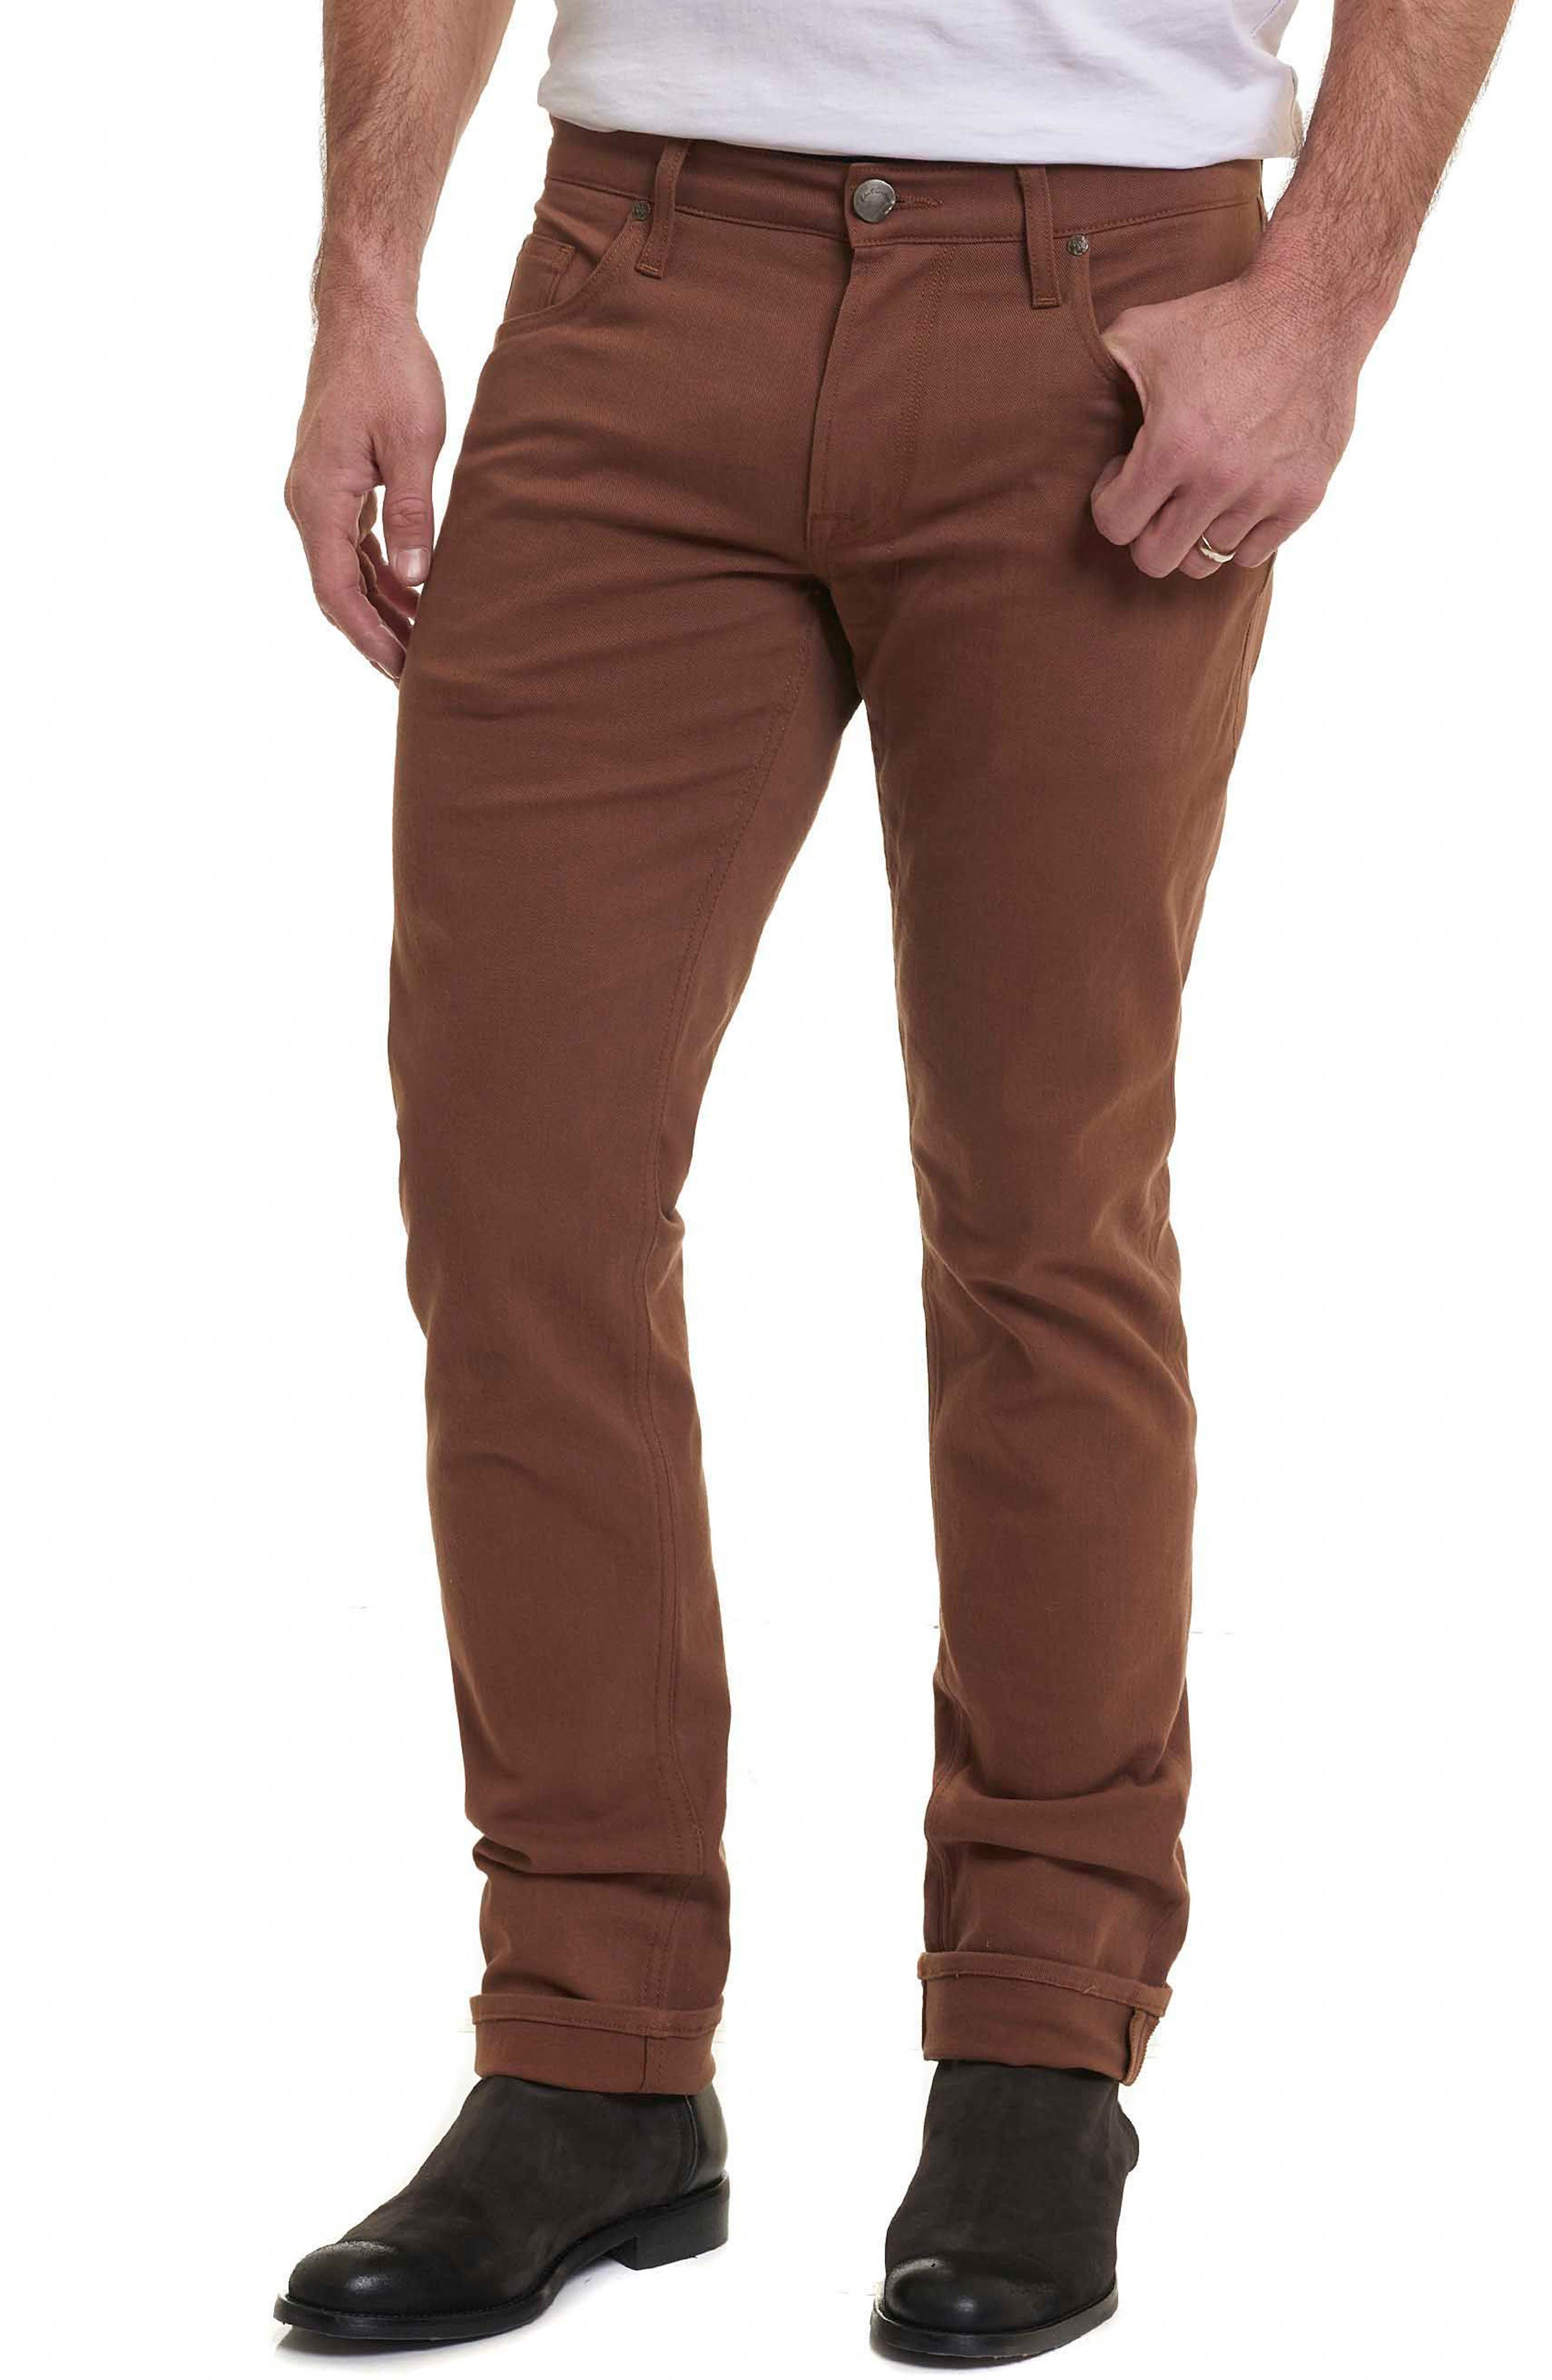 Corwin Classic Fit Jeans,                         Main,                         color, Copper